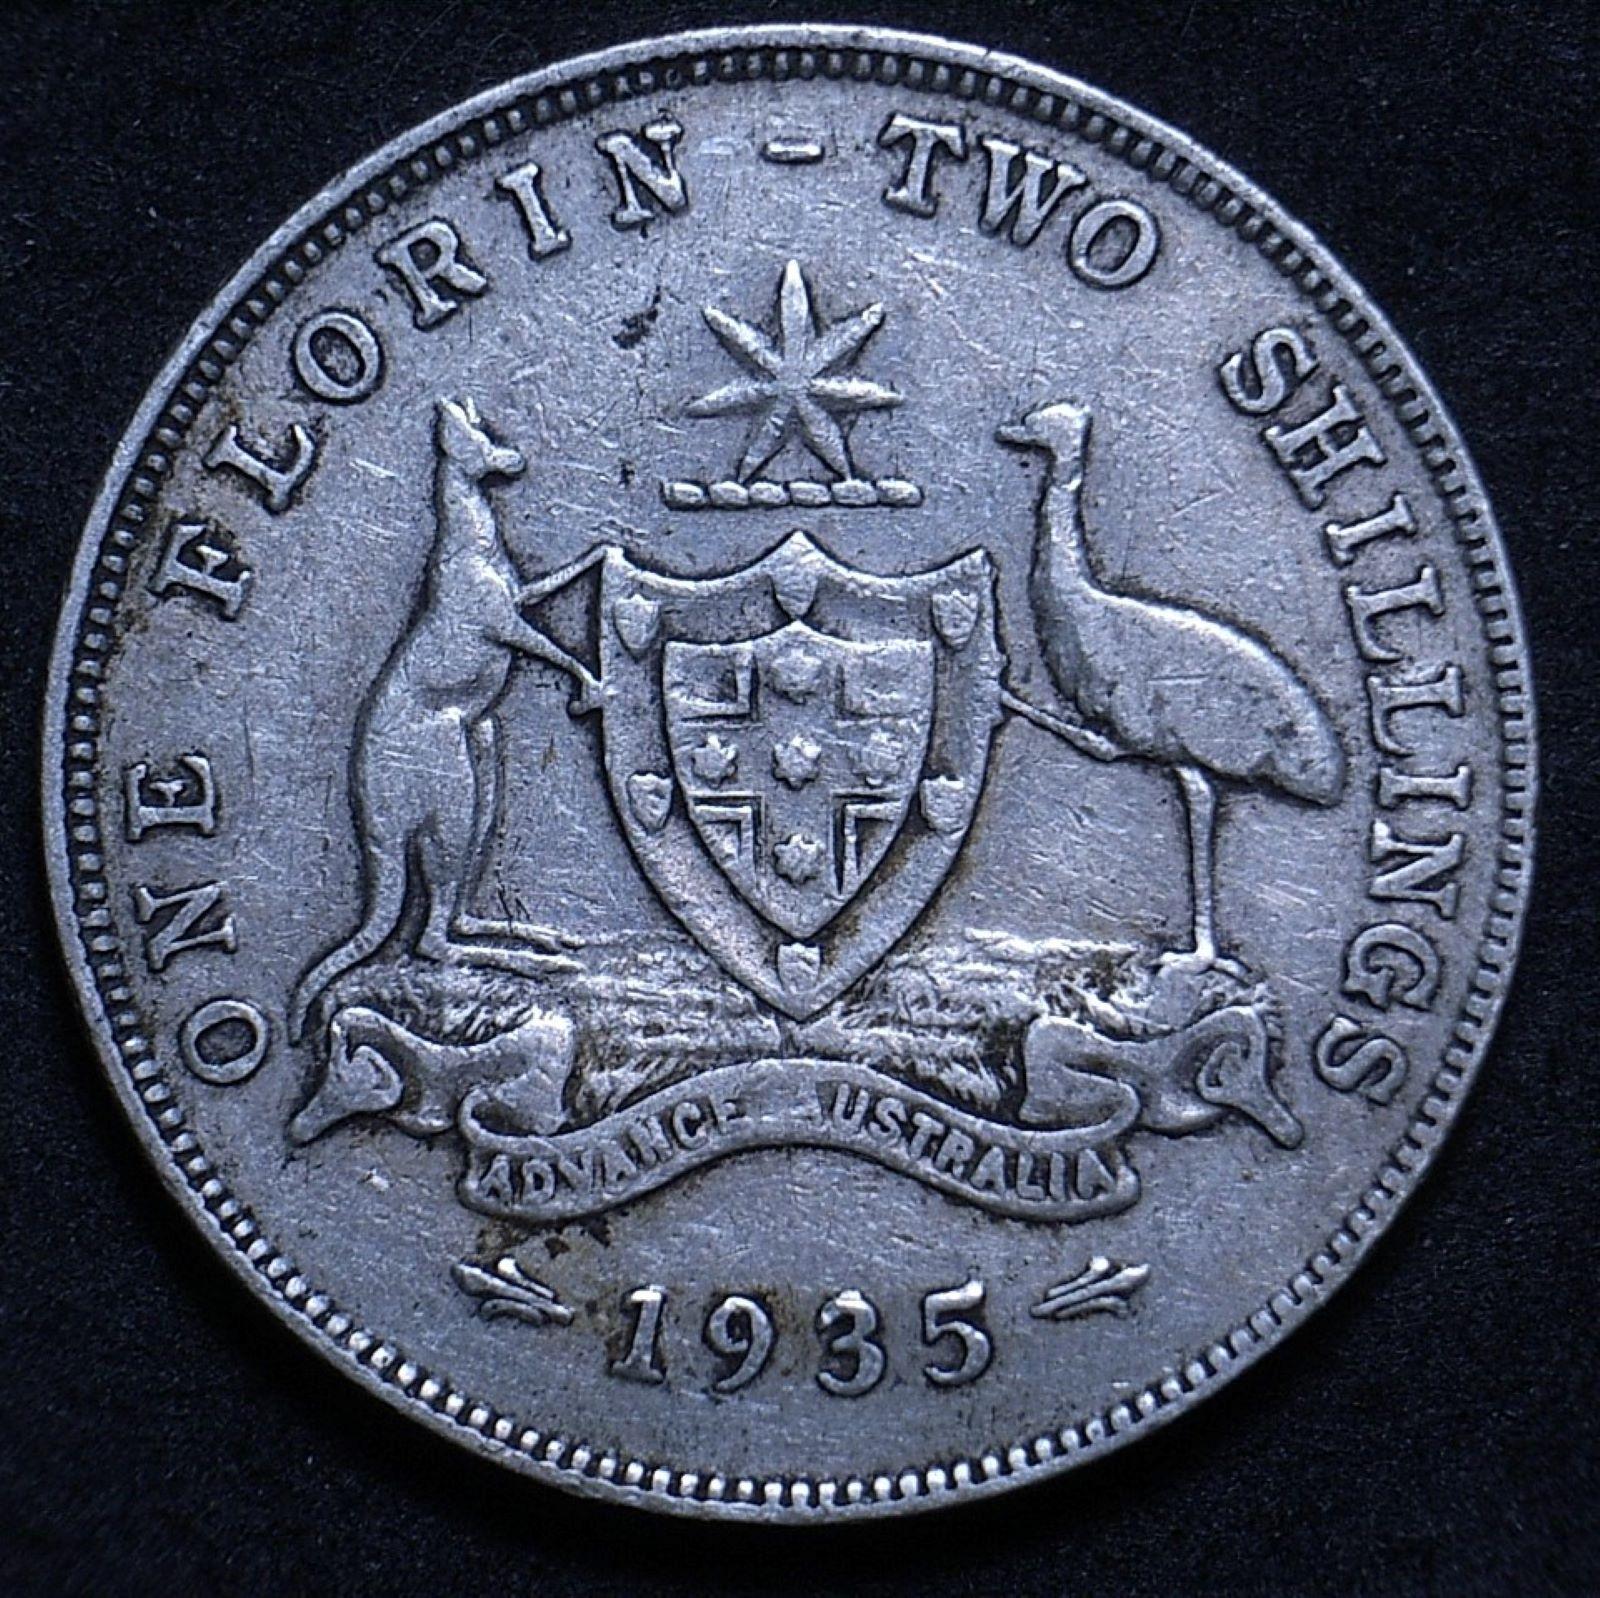 Aus Florin 1935 rev 1